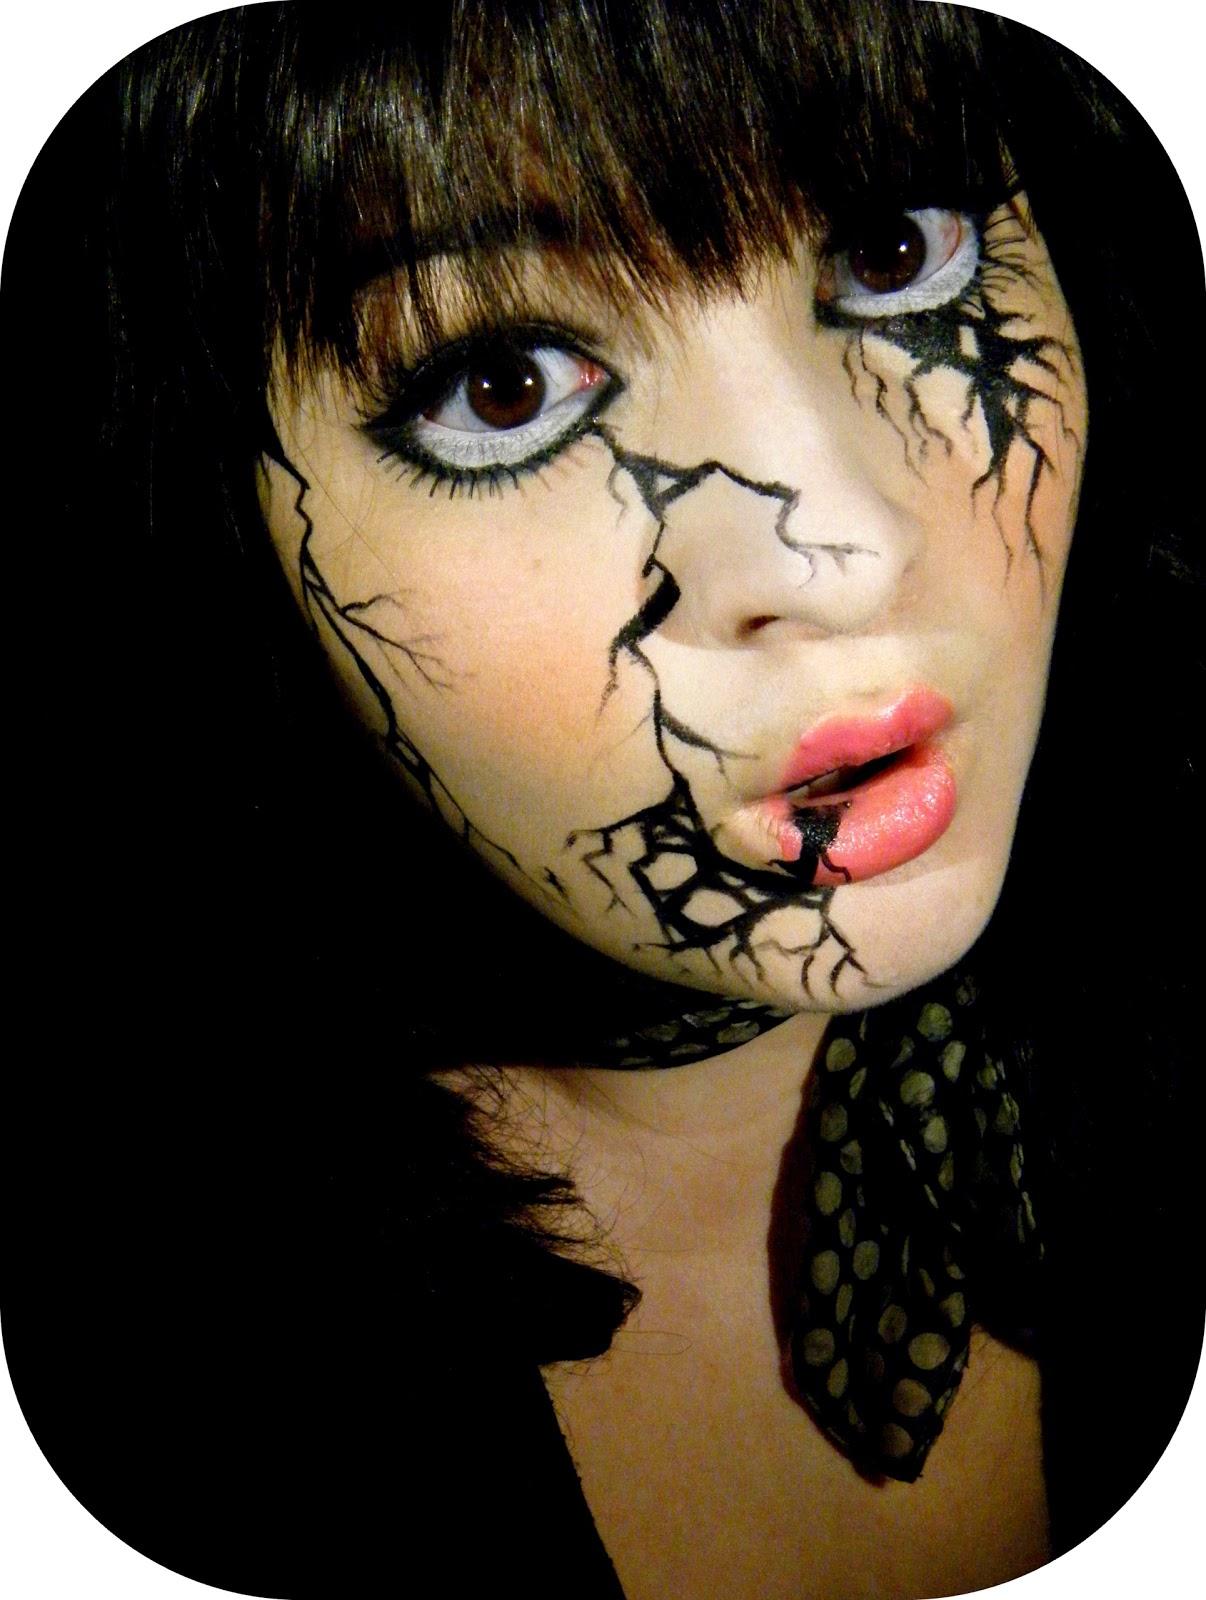 Mon petit coin beaut maquillage halloween 2 broken doll - Maquillage halloween qui fait peur ...